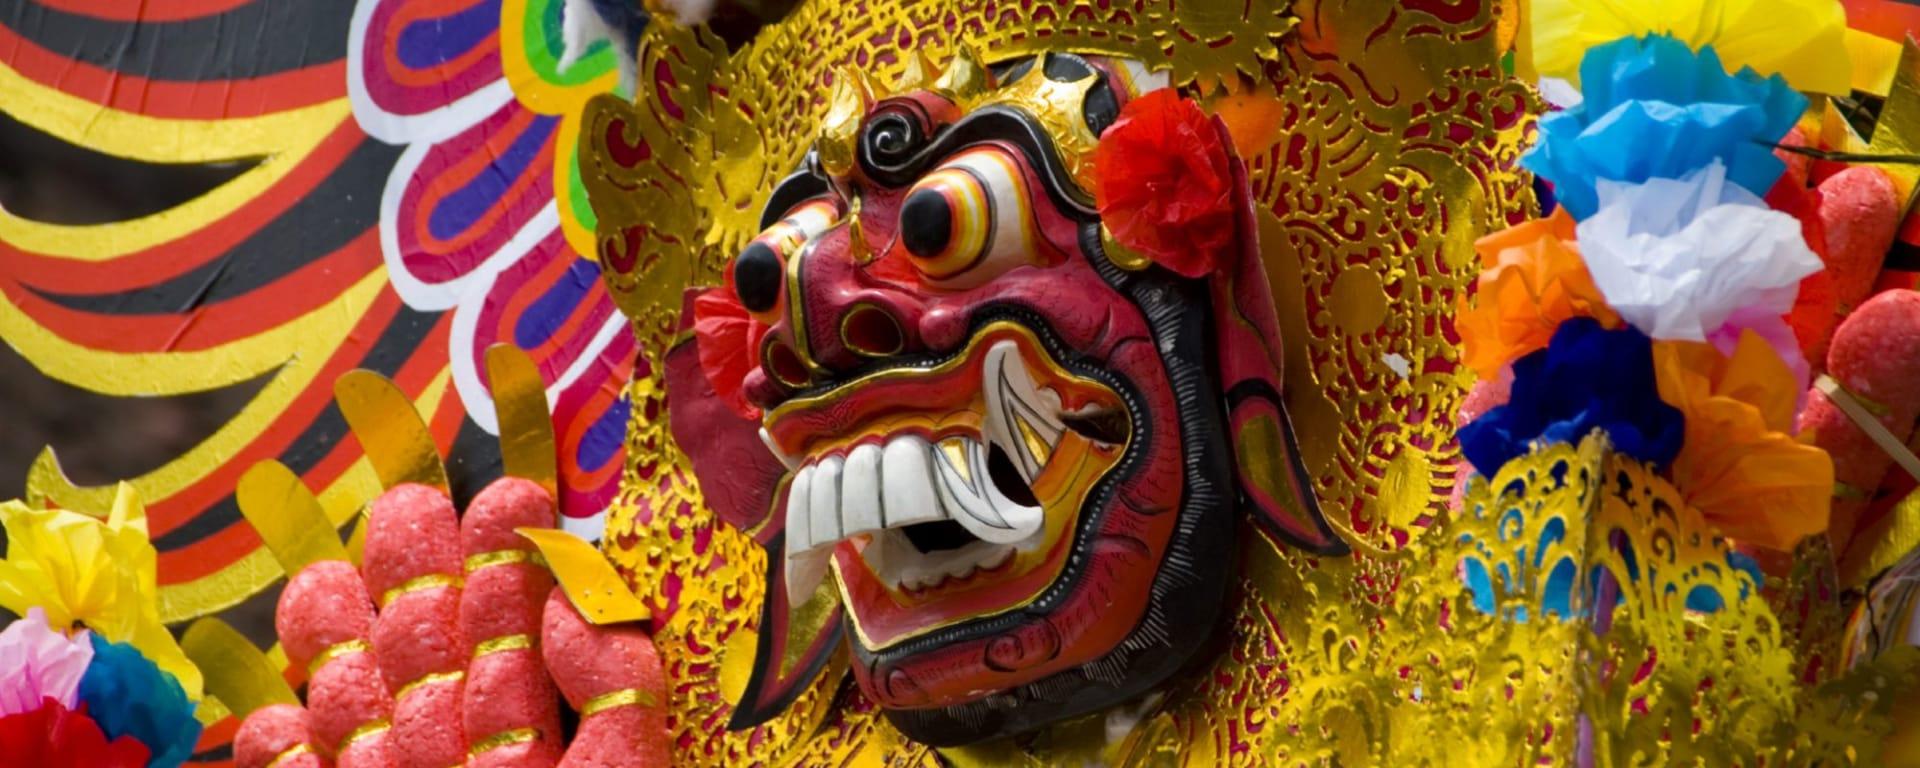 Höhepunkte Balis ab Südbali: Bali Mask